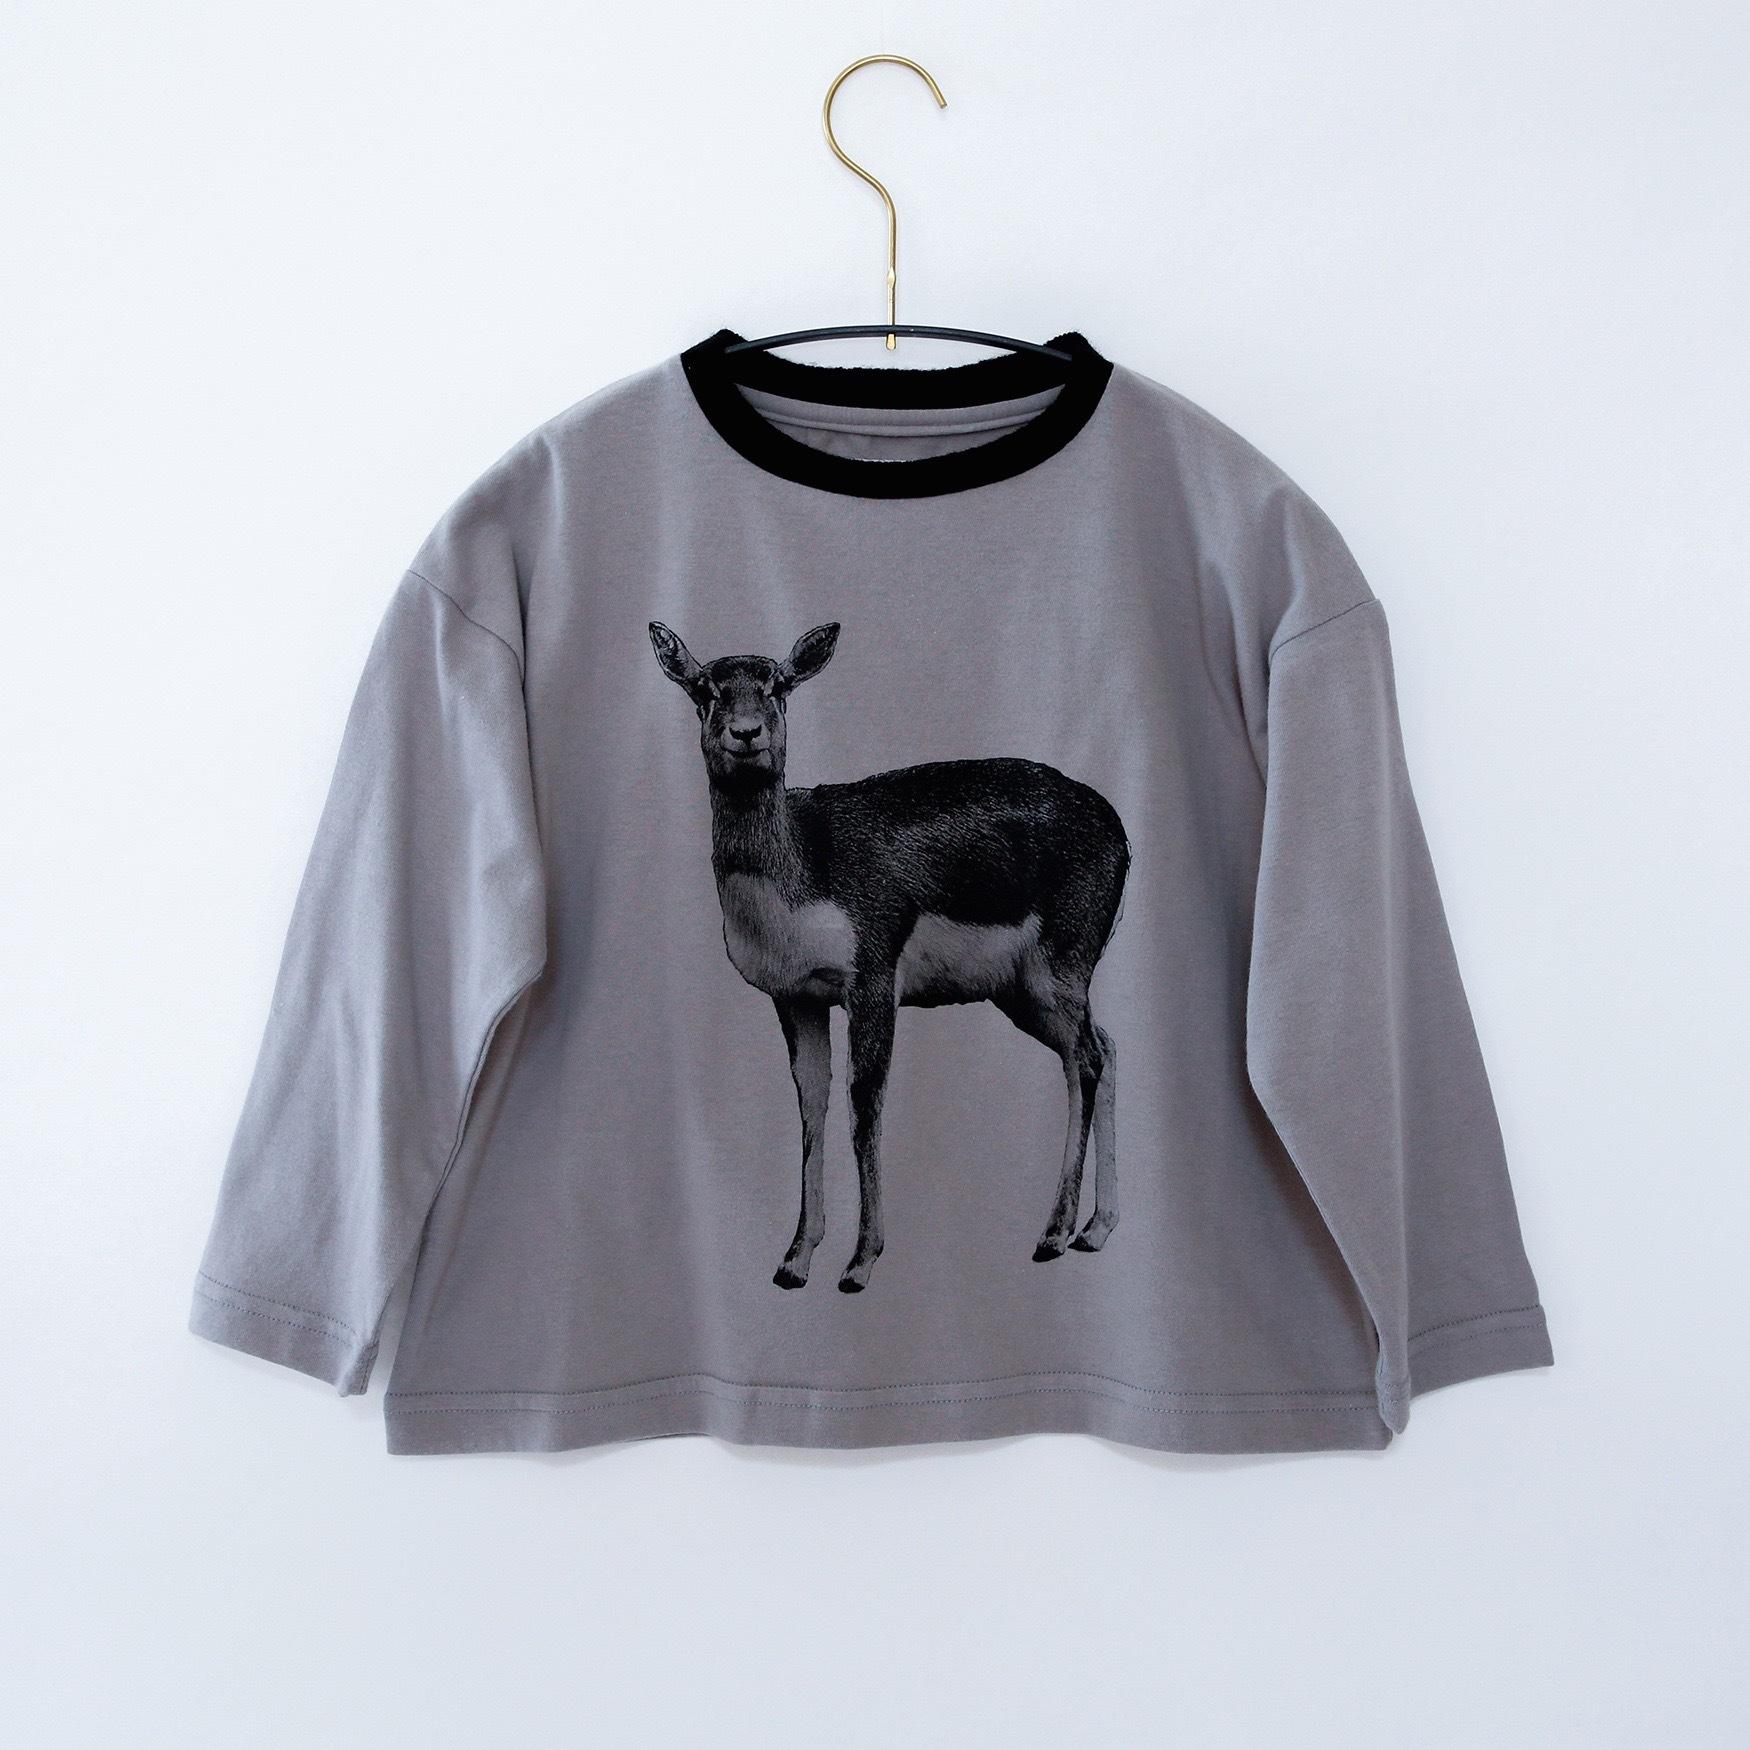 《michirico 2020AW》Deer longsleeveT / ashgray / S・M